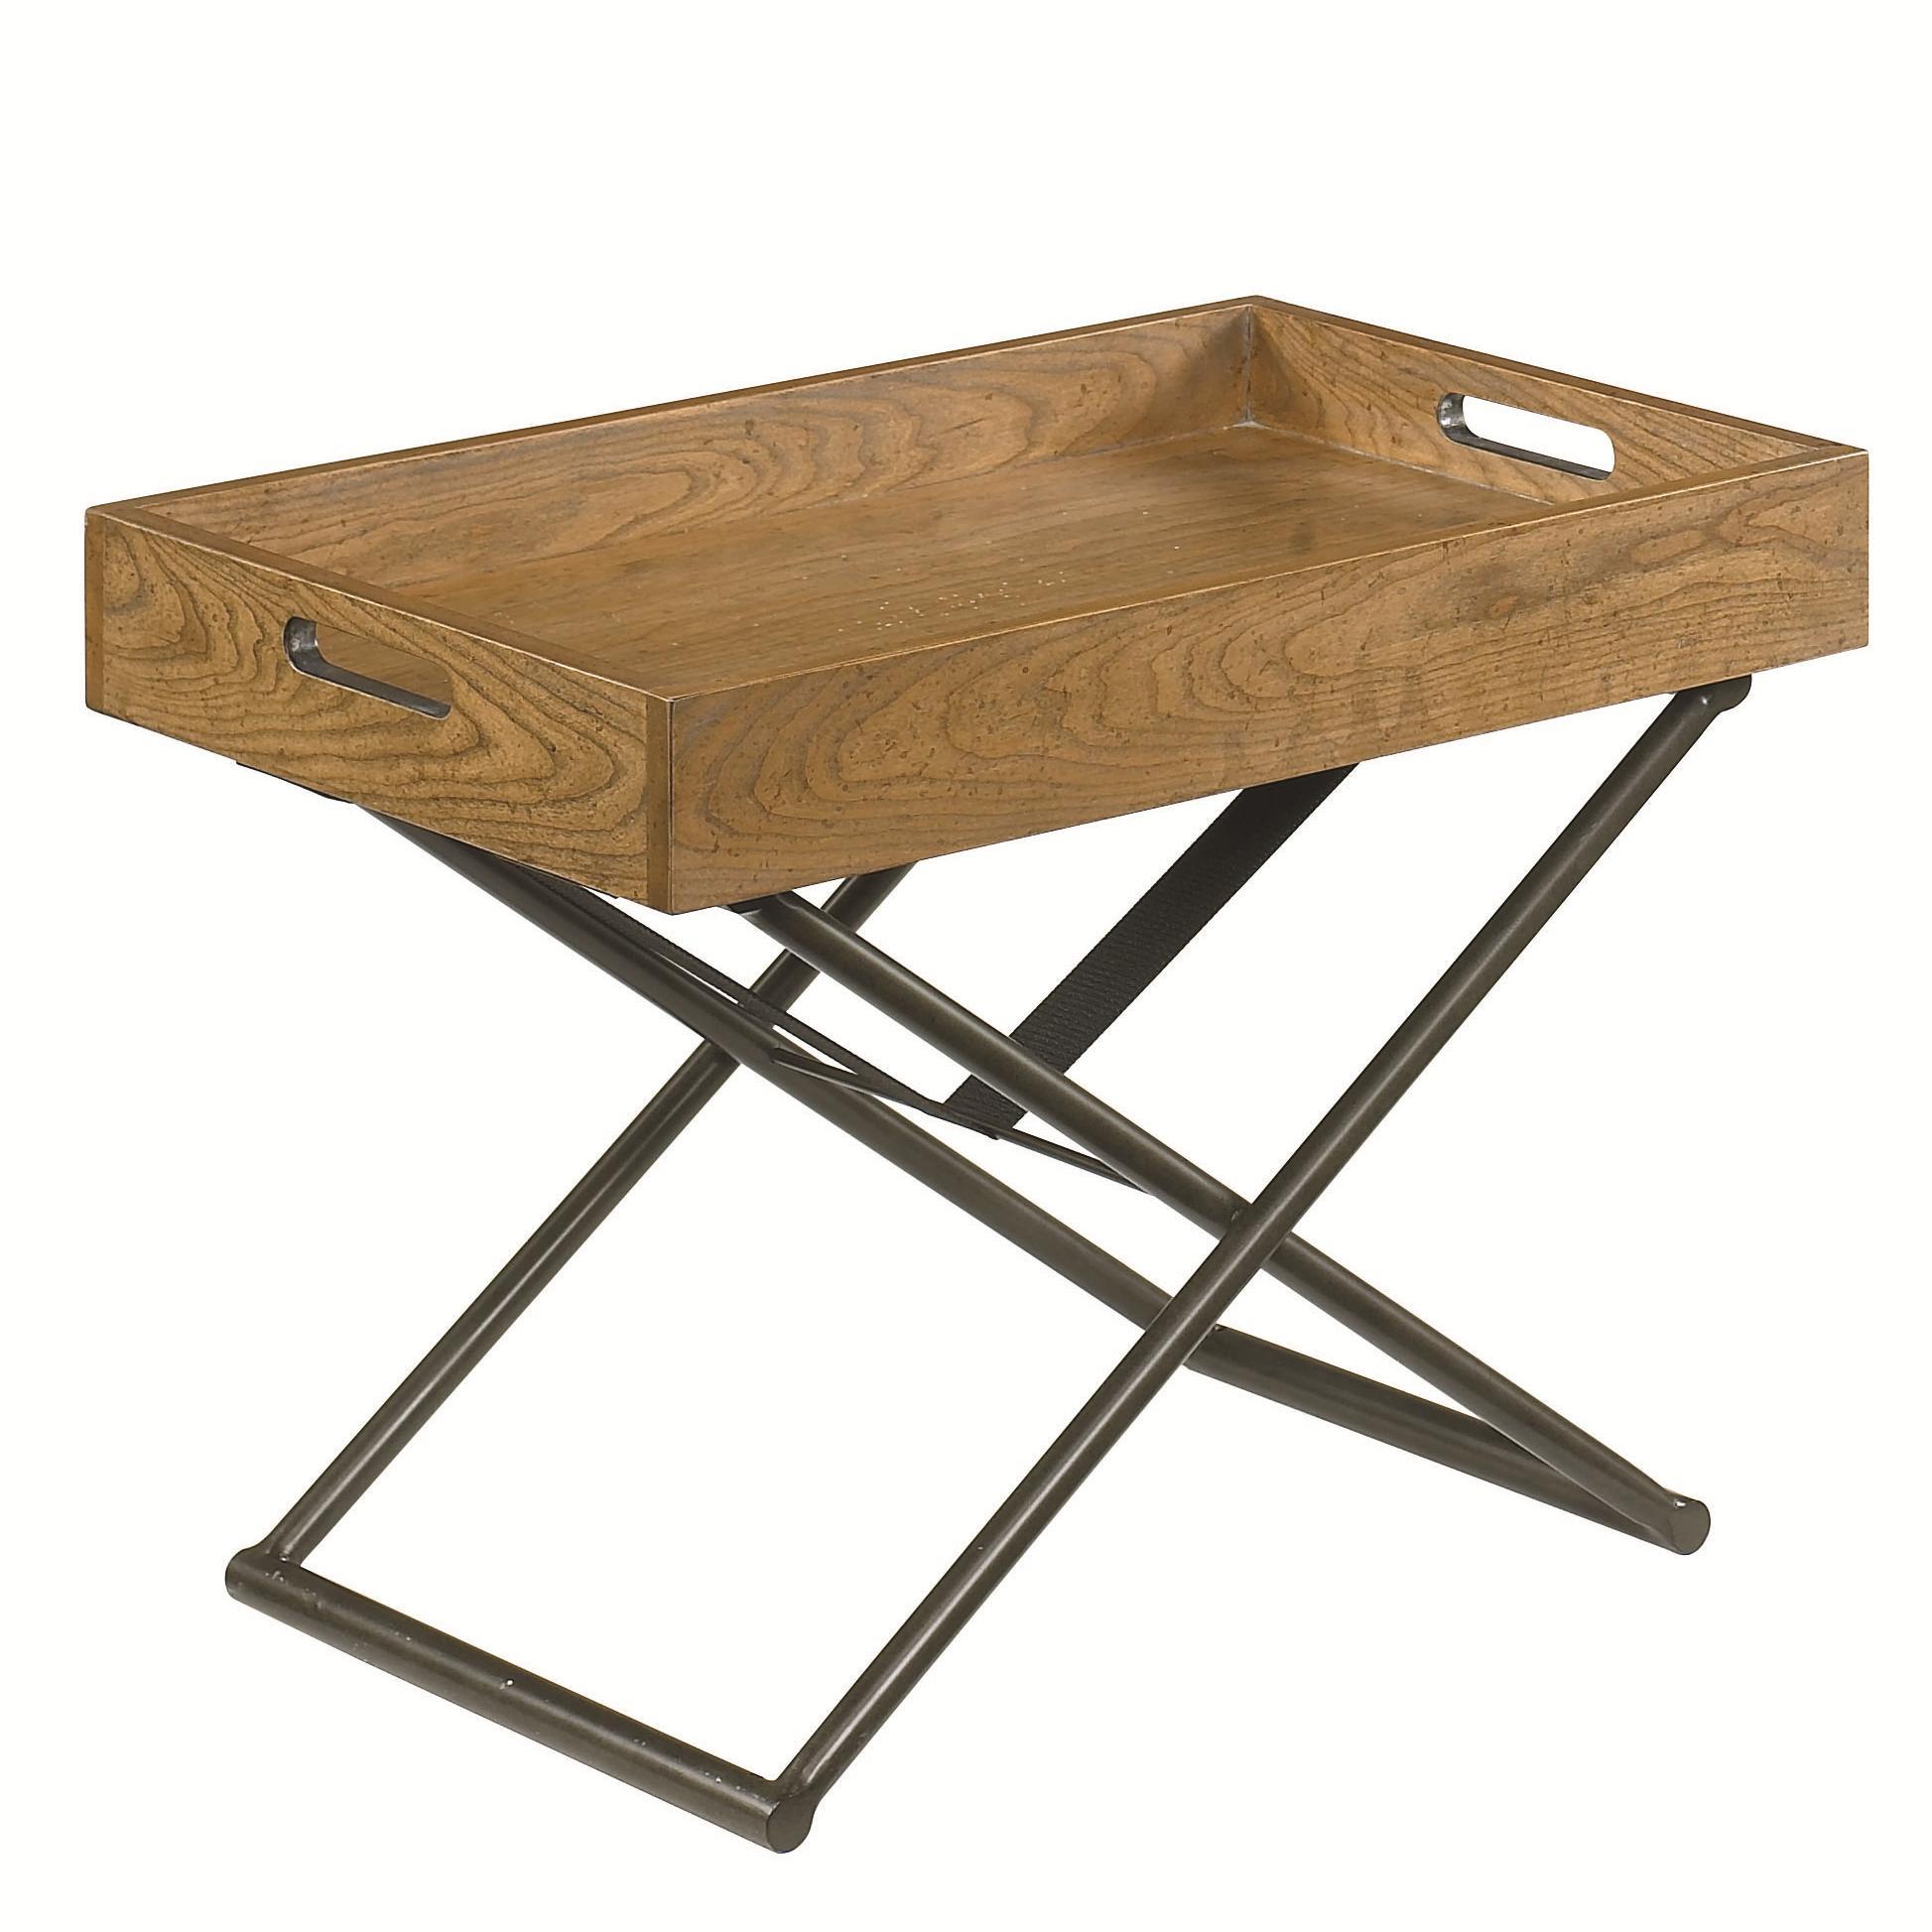 Hammary Hidden Treasures Adjustable Tray Table - Item Number: 090-317